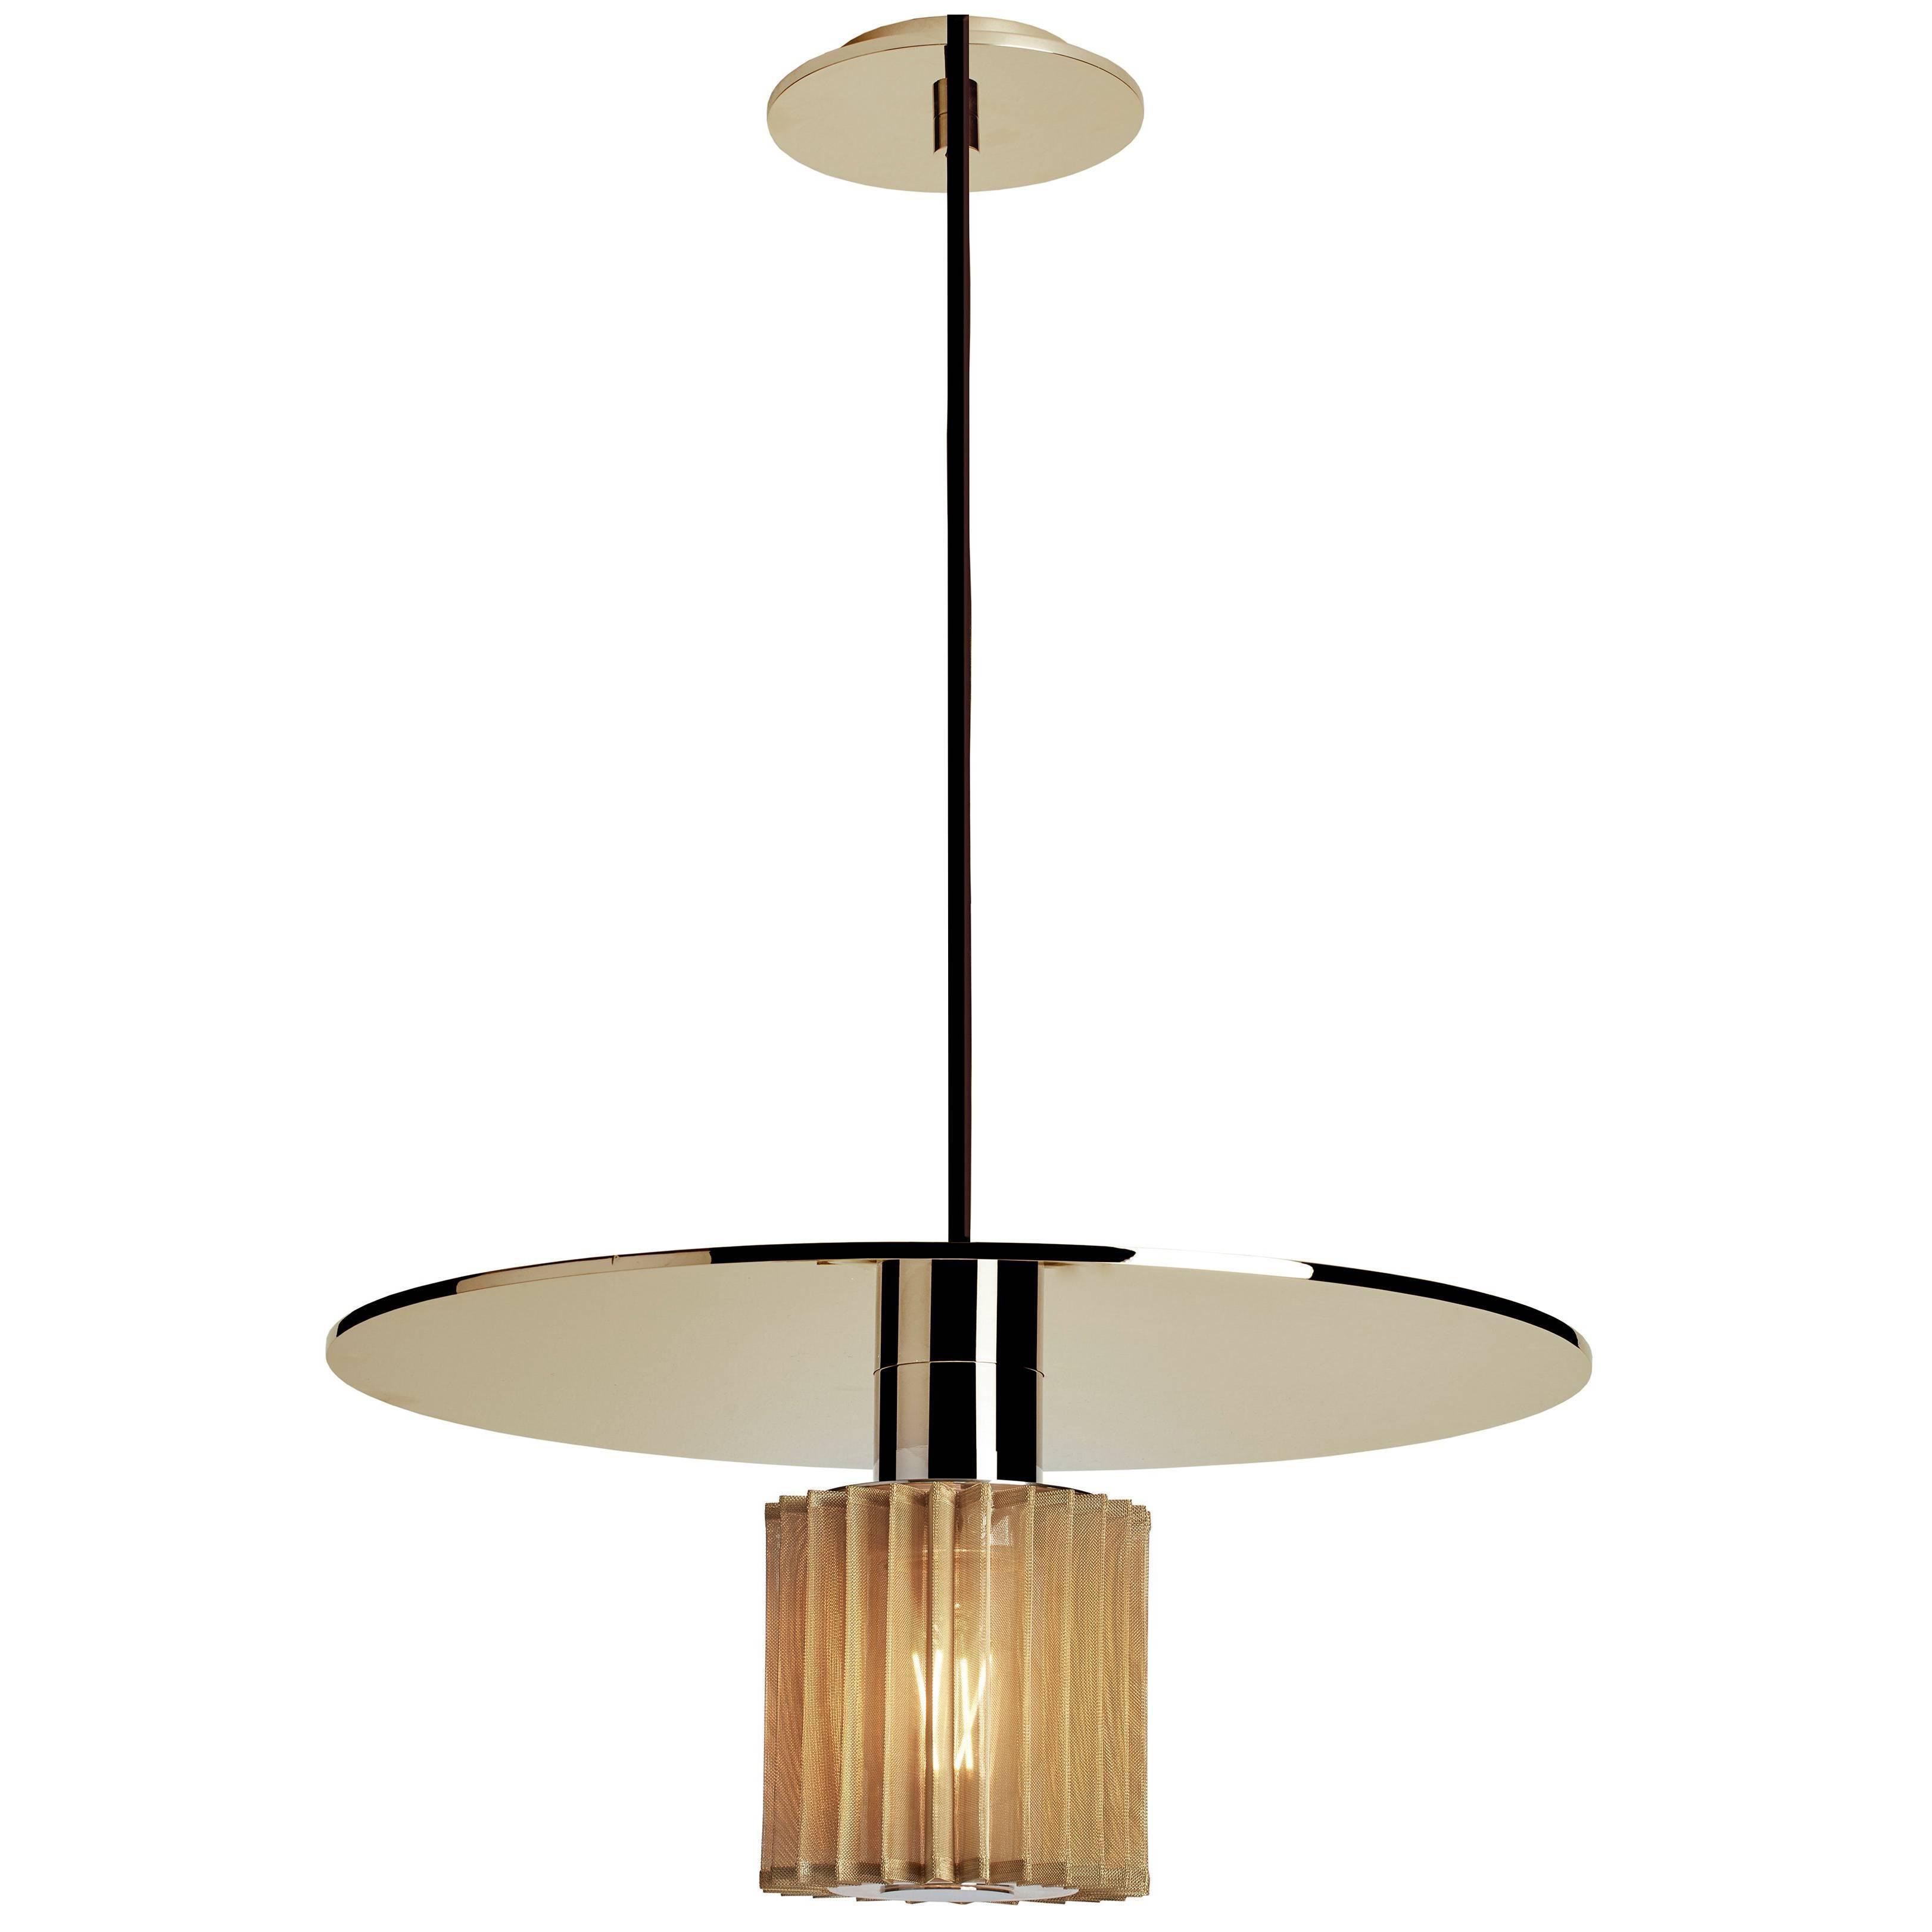 Groove Series Orb Pendant, Contemporary Handmade Glass Lighting - In ...